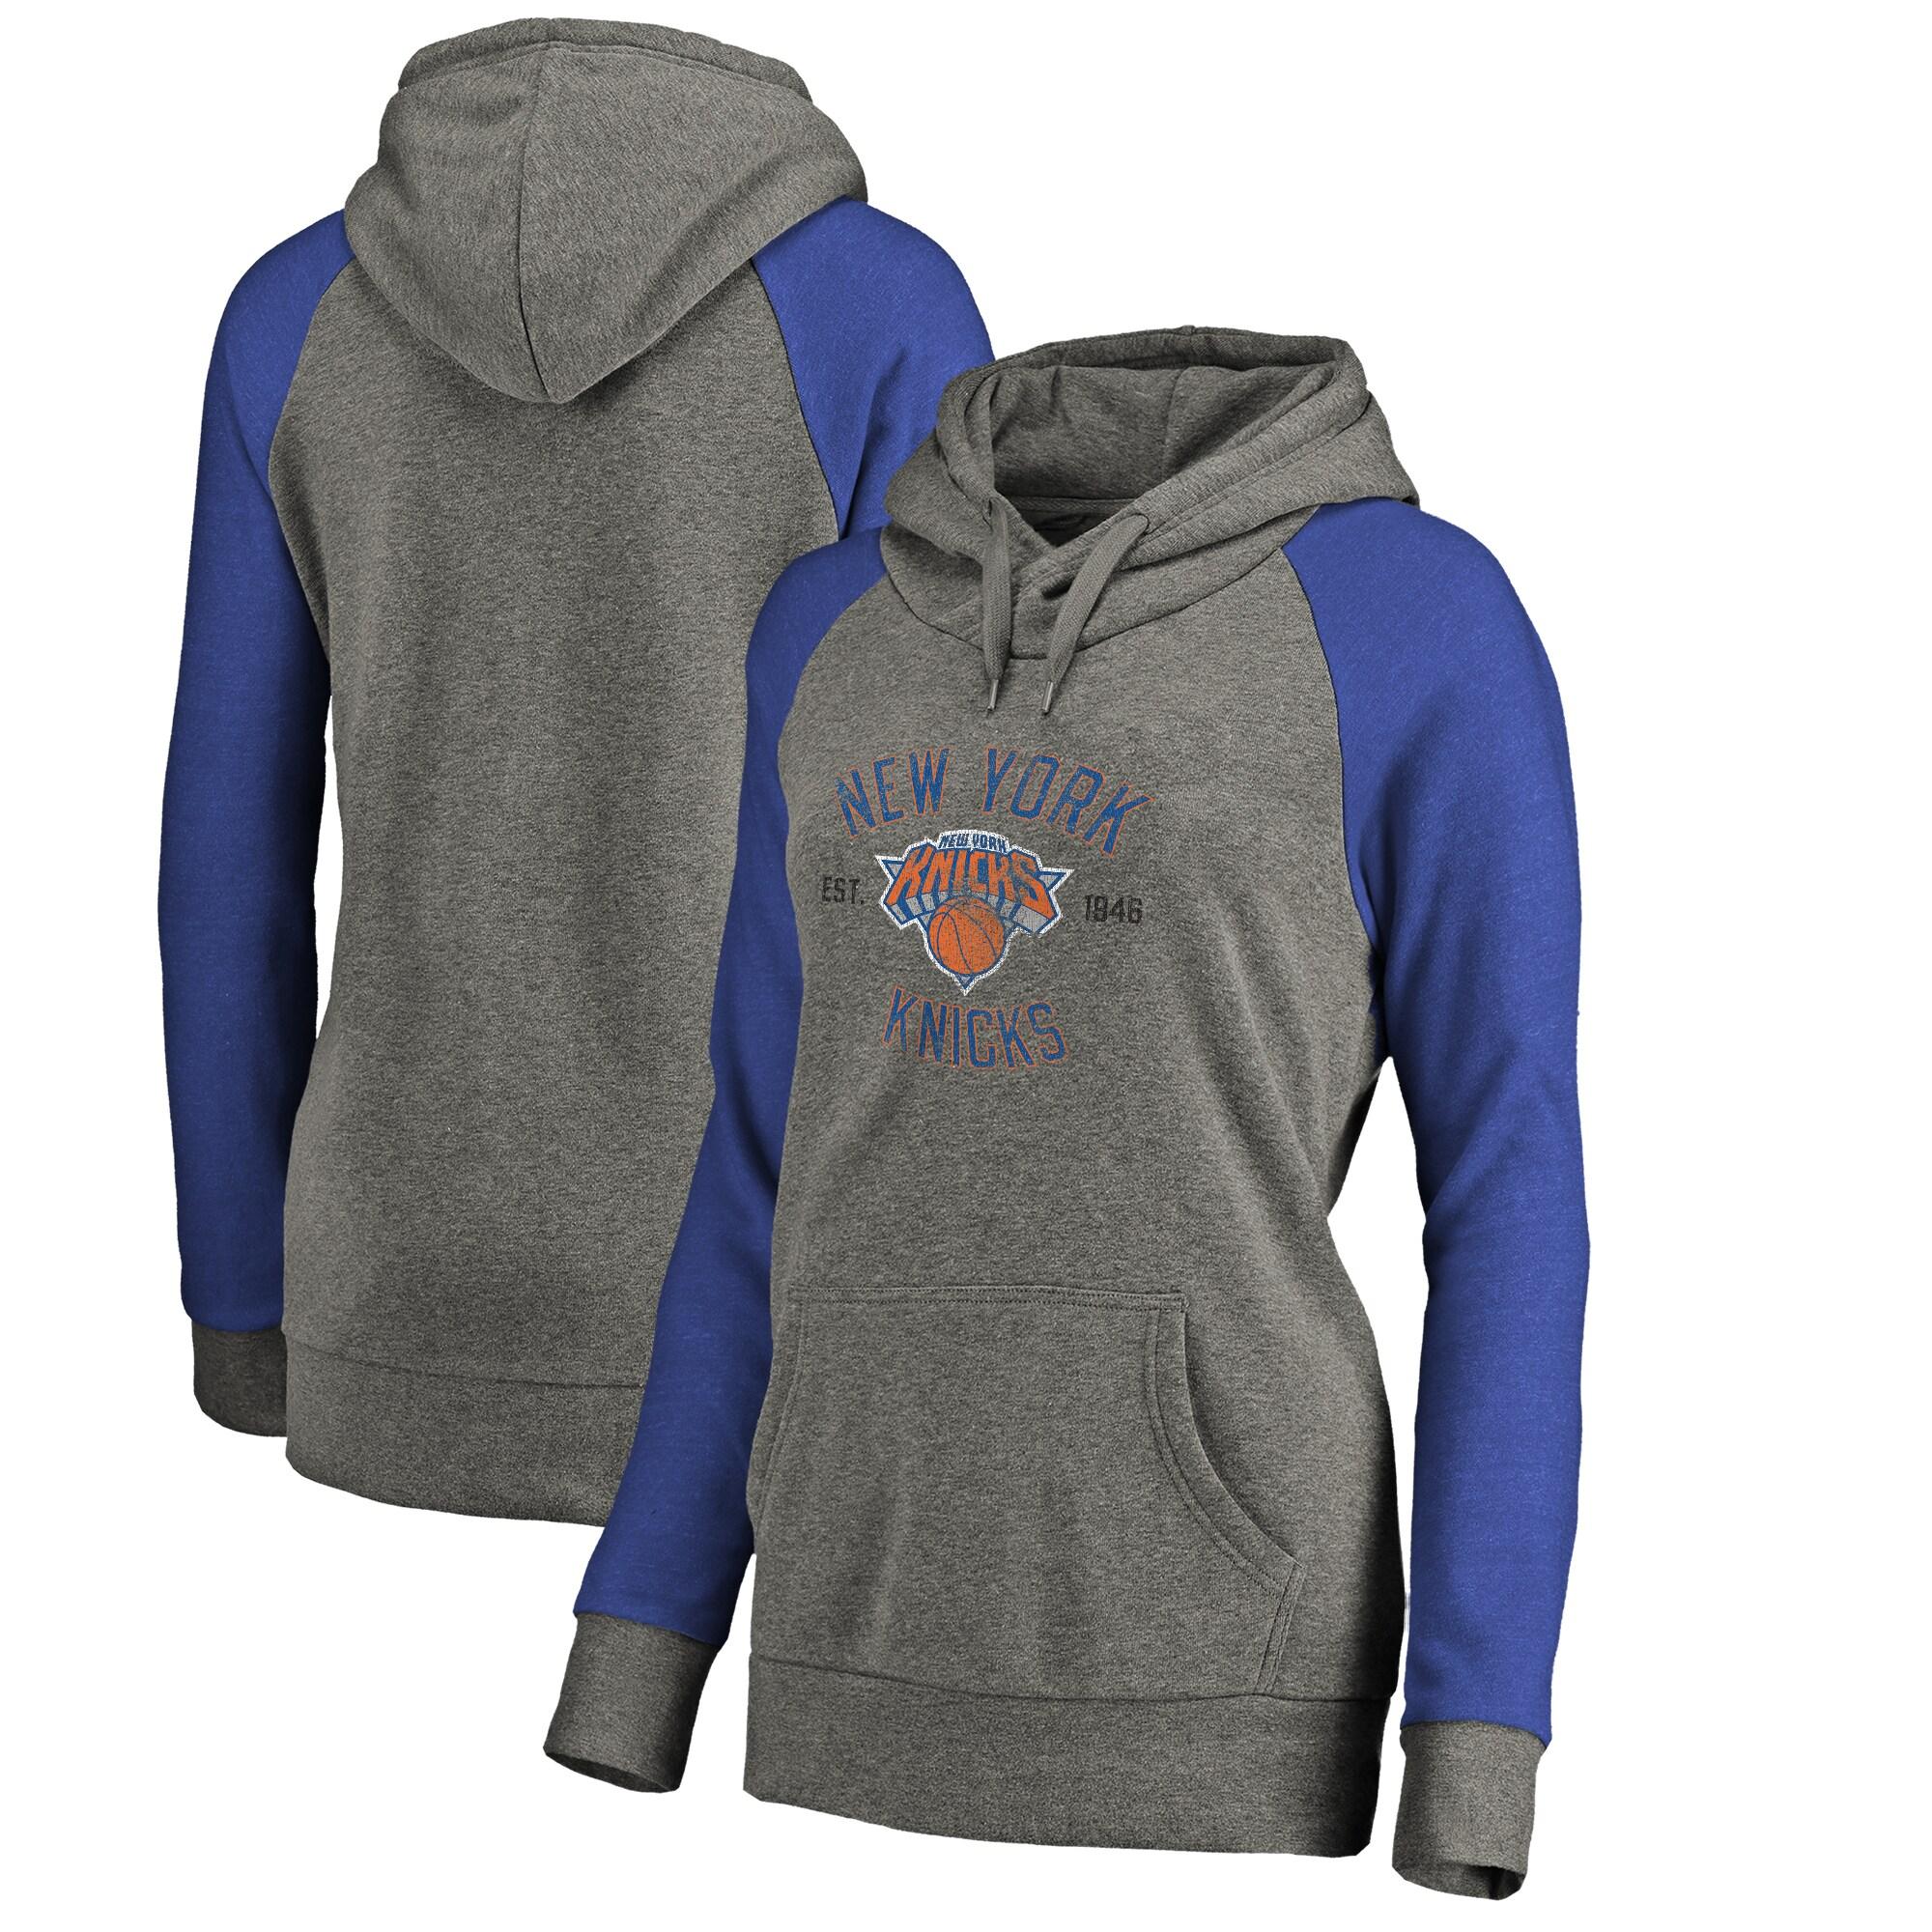 New York Knicks Fanatics Branded Women's Heritage Tri-Blend Raglan Plus Size Pullover Hoodie - Heathered Gray